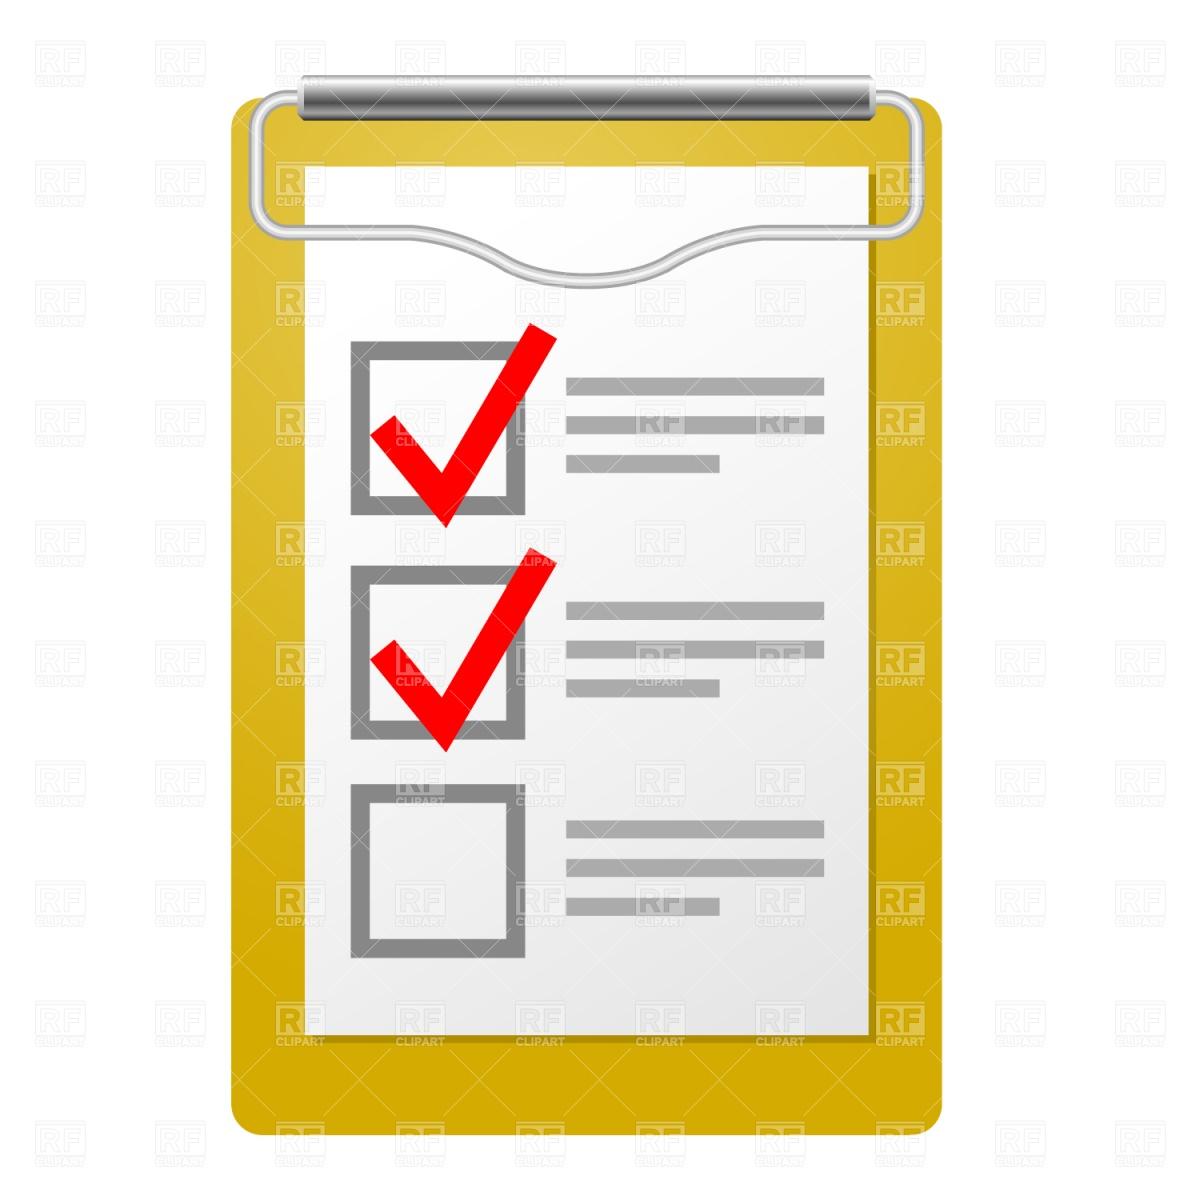 Overview clipart checklist Clipart Free Clipart Checklist Clipart